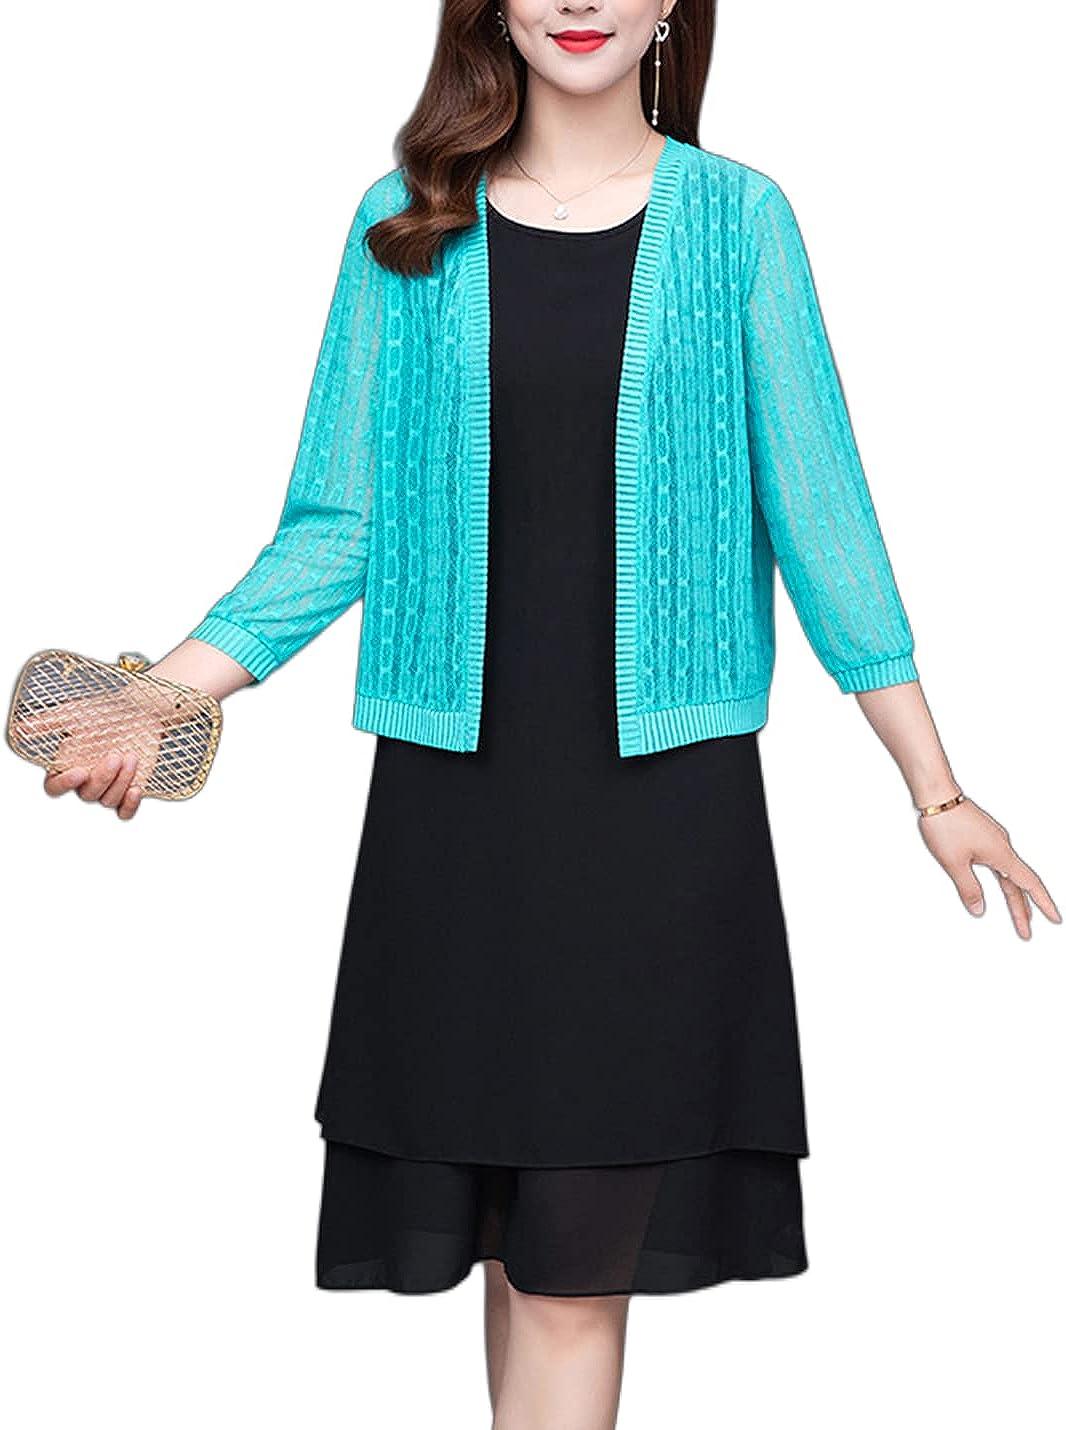 FindThy Women's Chainlike Ribbed Lace Cardigan See-Through 3/4 Sleeve Bolero Shrug Knitwear